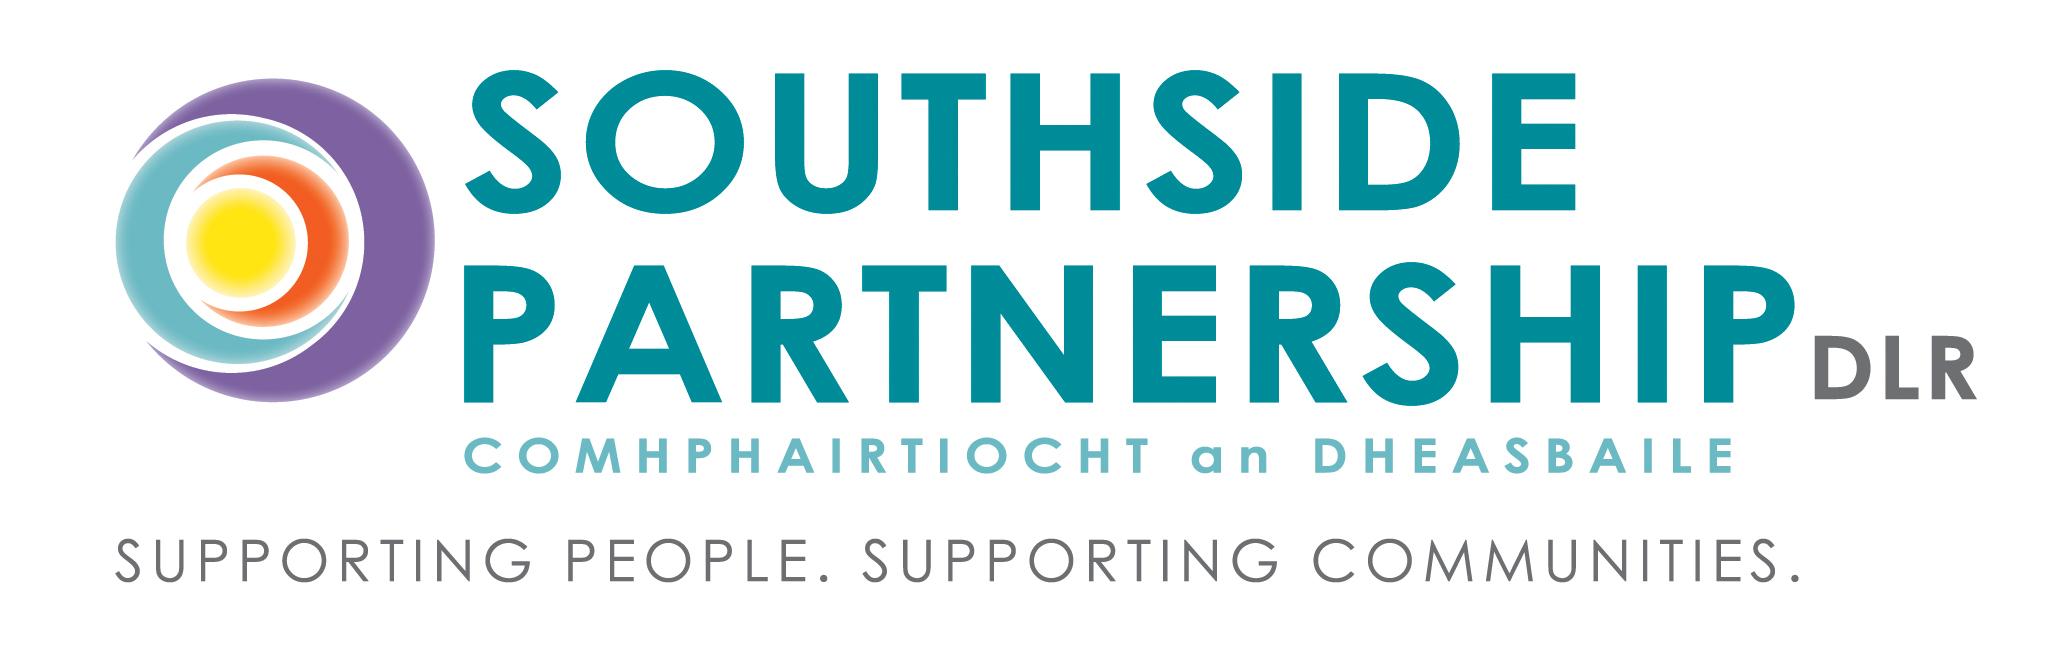 southside-partnership-logo